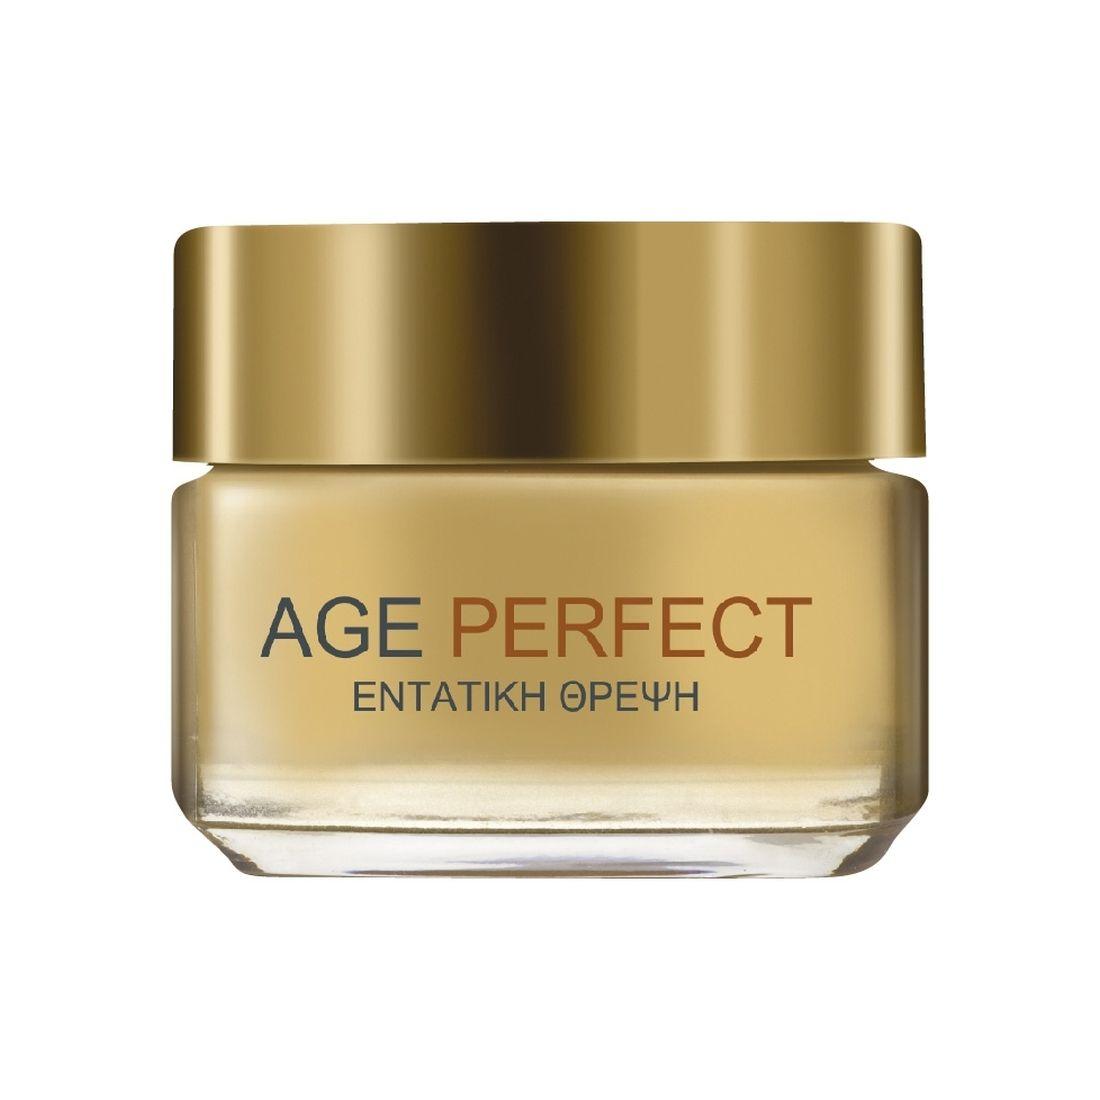 L'Oréal Age Re-Perfect Pro-Calcium Day Cream 50ml  Τύπος Δέρματος : Όλοι οι τύποι